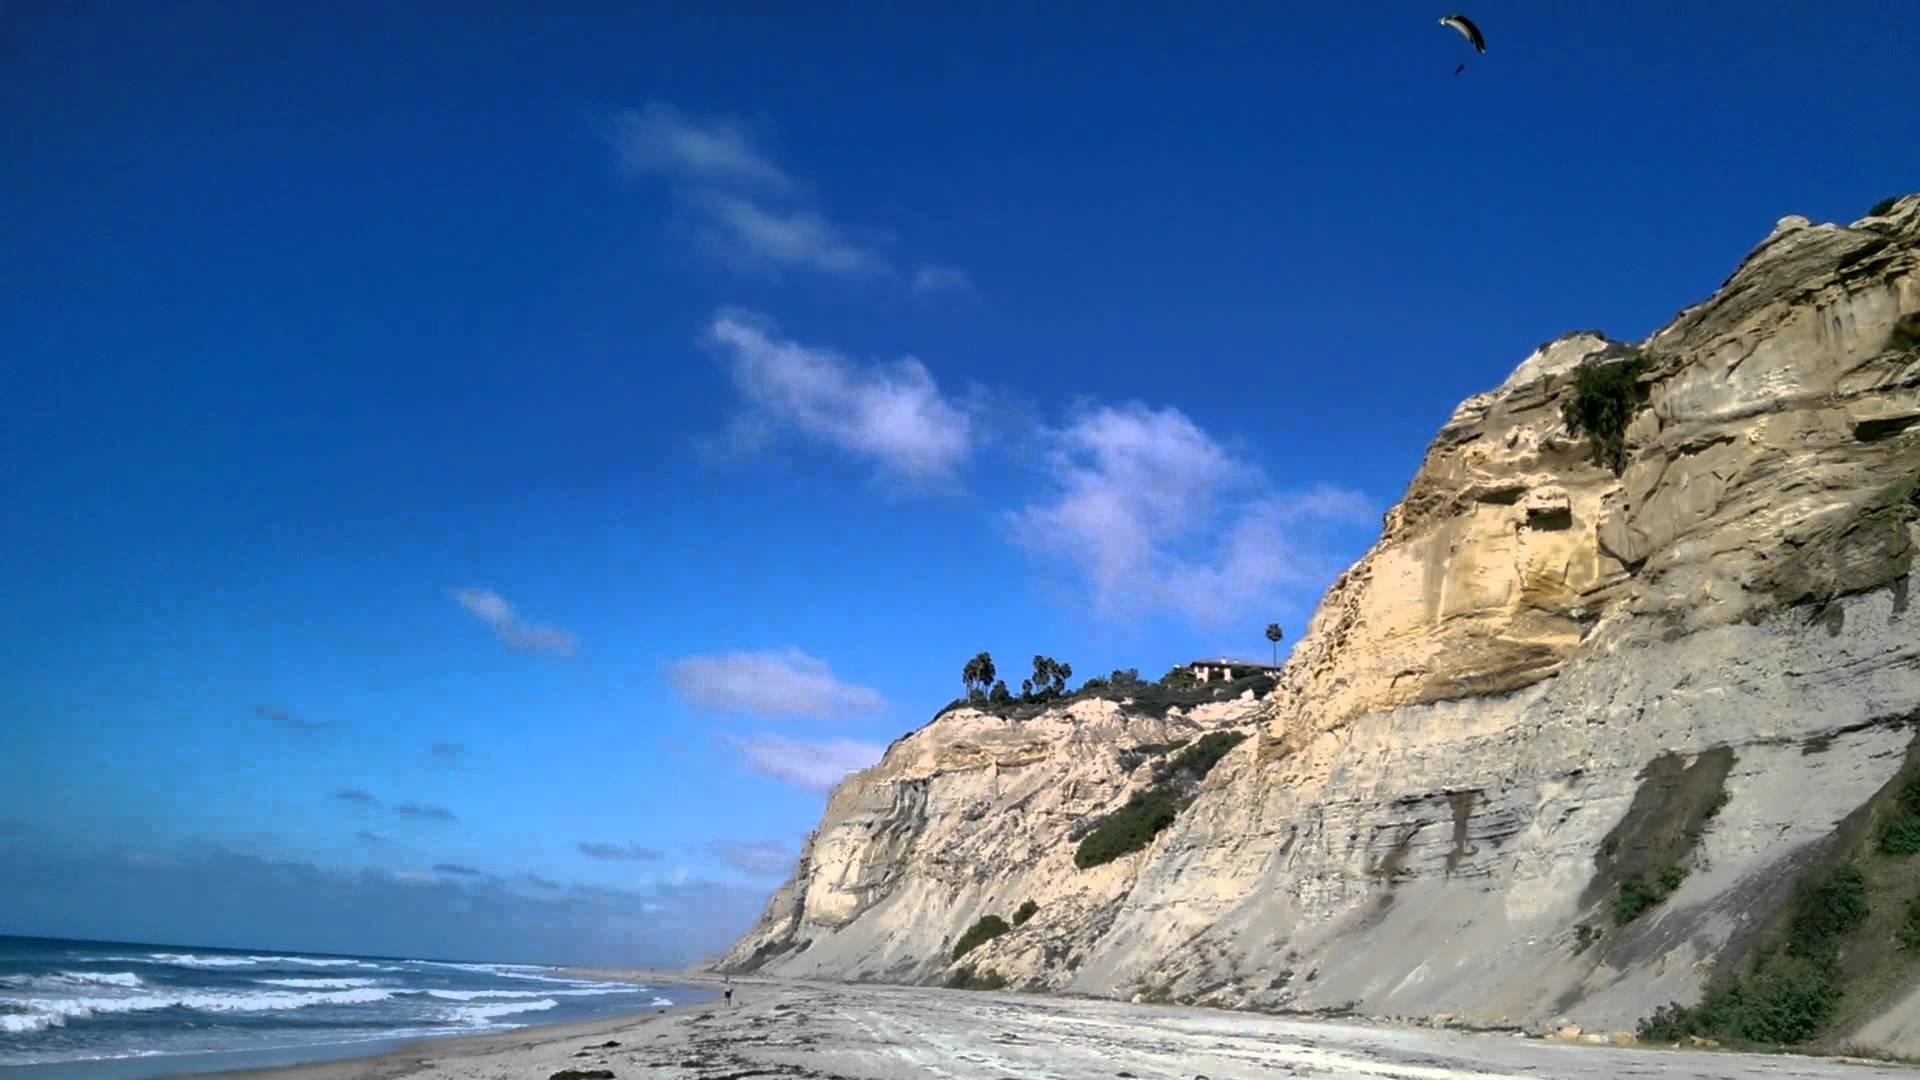 Paragliders on Black's Beach, San Diego, CA